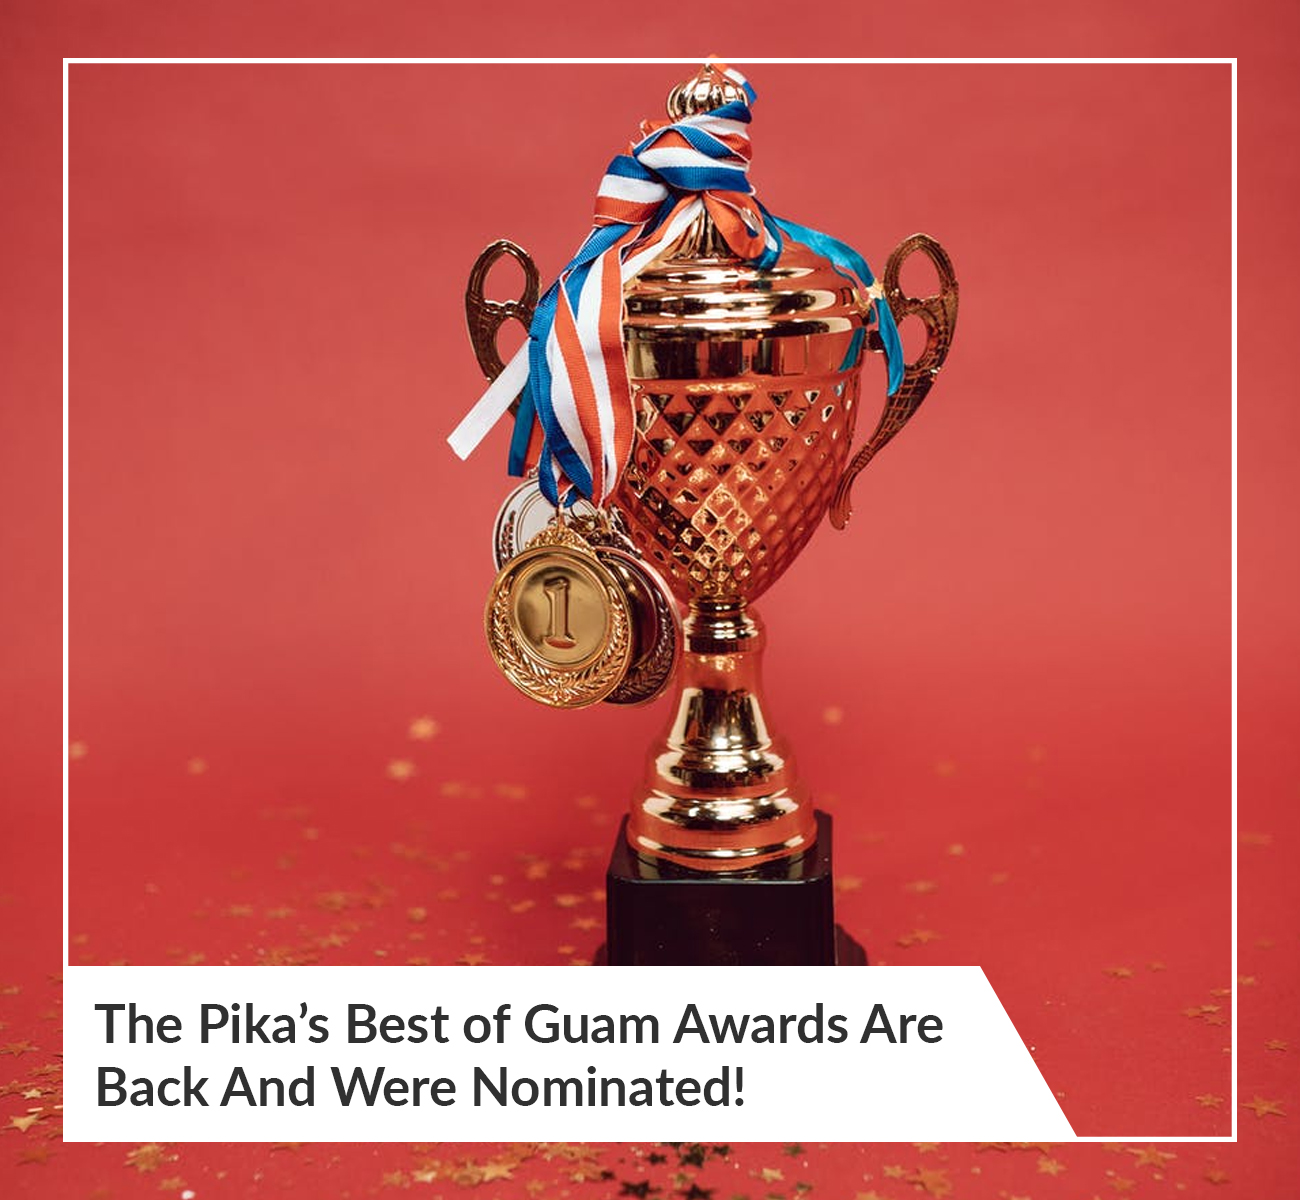 Pika's Best Guam Awards